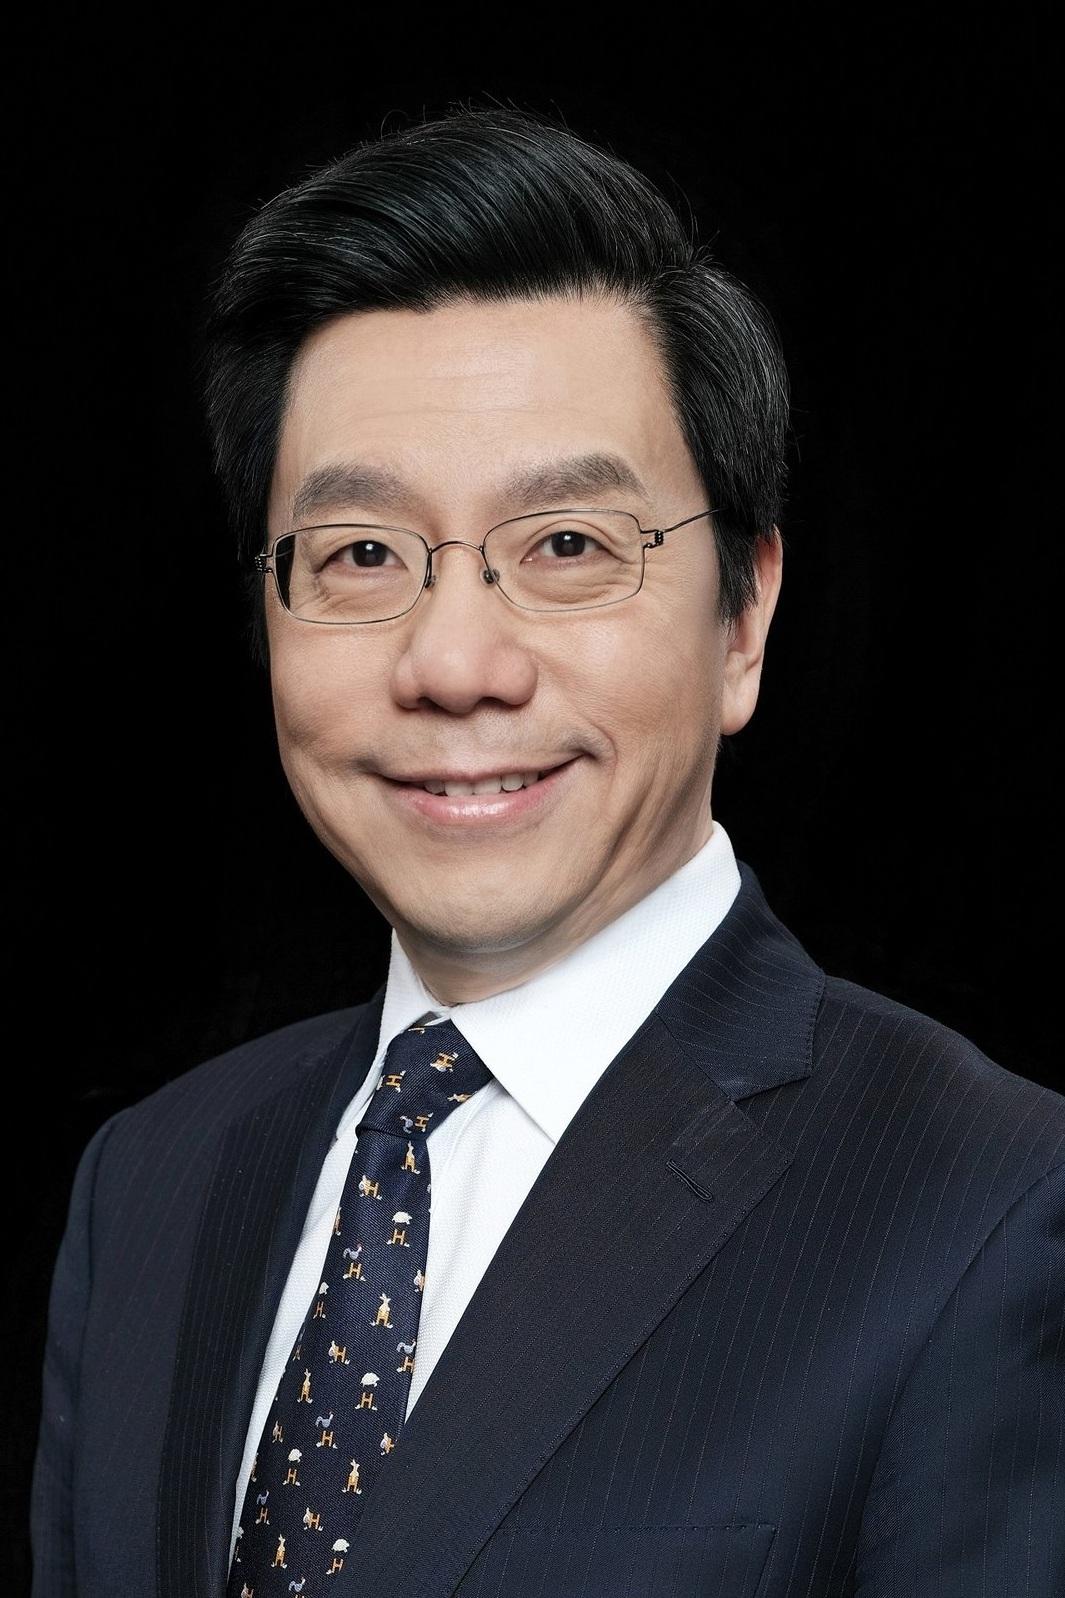 DR. KAI-FU LEE  Chairman, CEO Sinovation Ventures